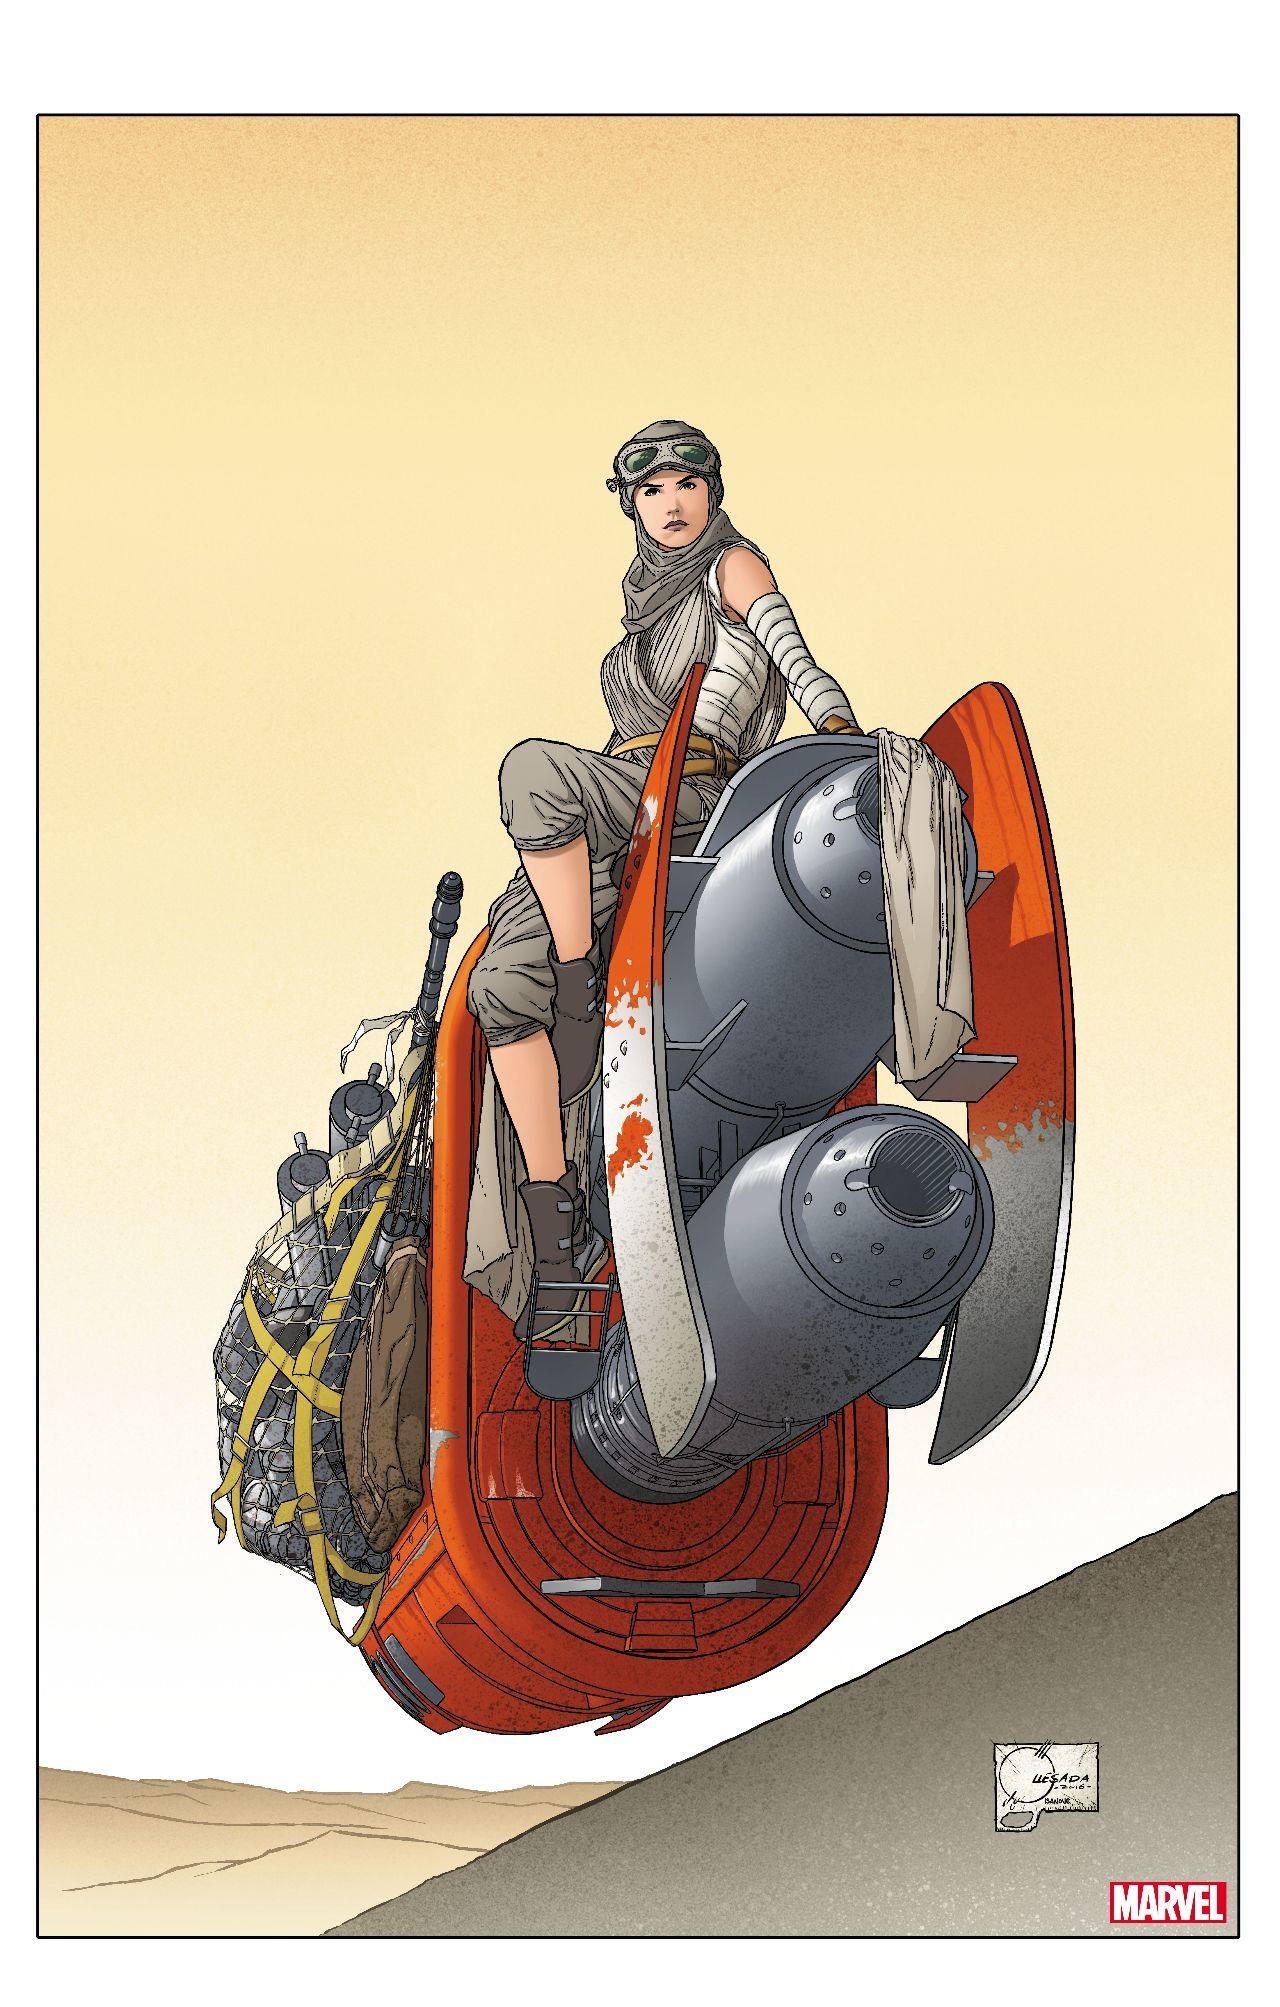 Star Wars The Last Jedi Adaptation Cover #2